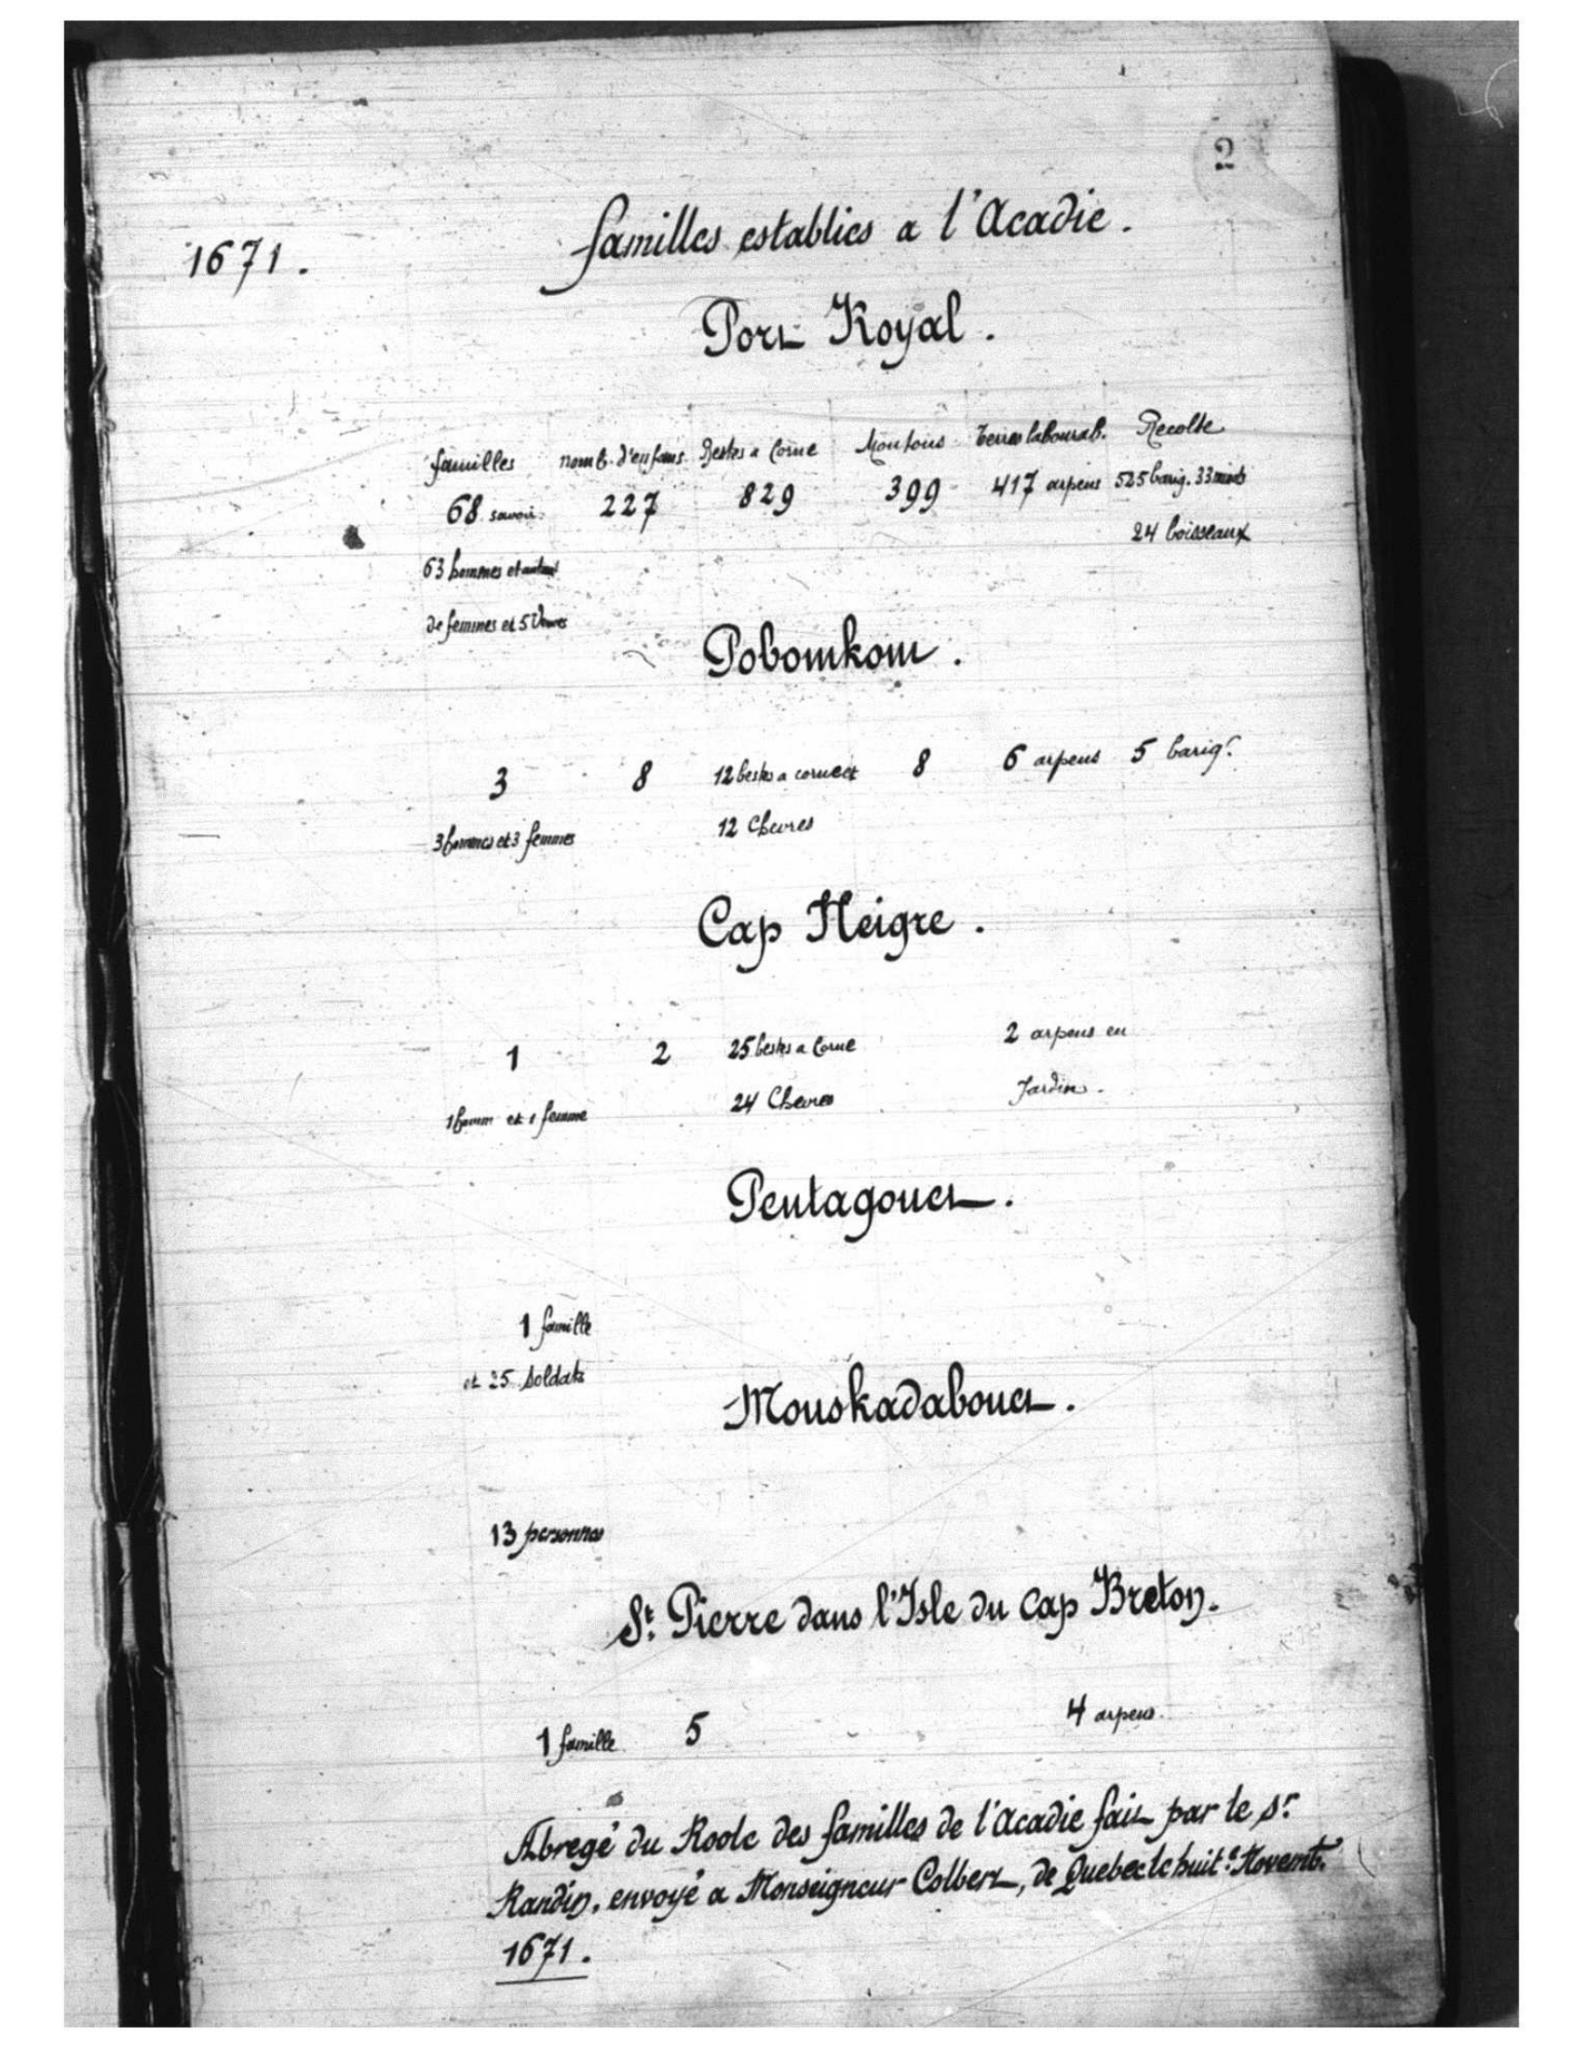 Recensement 1671 Acadie p2